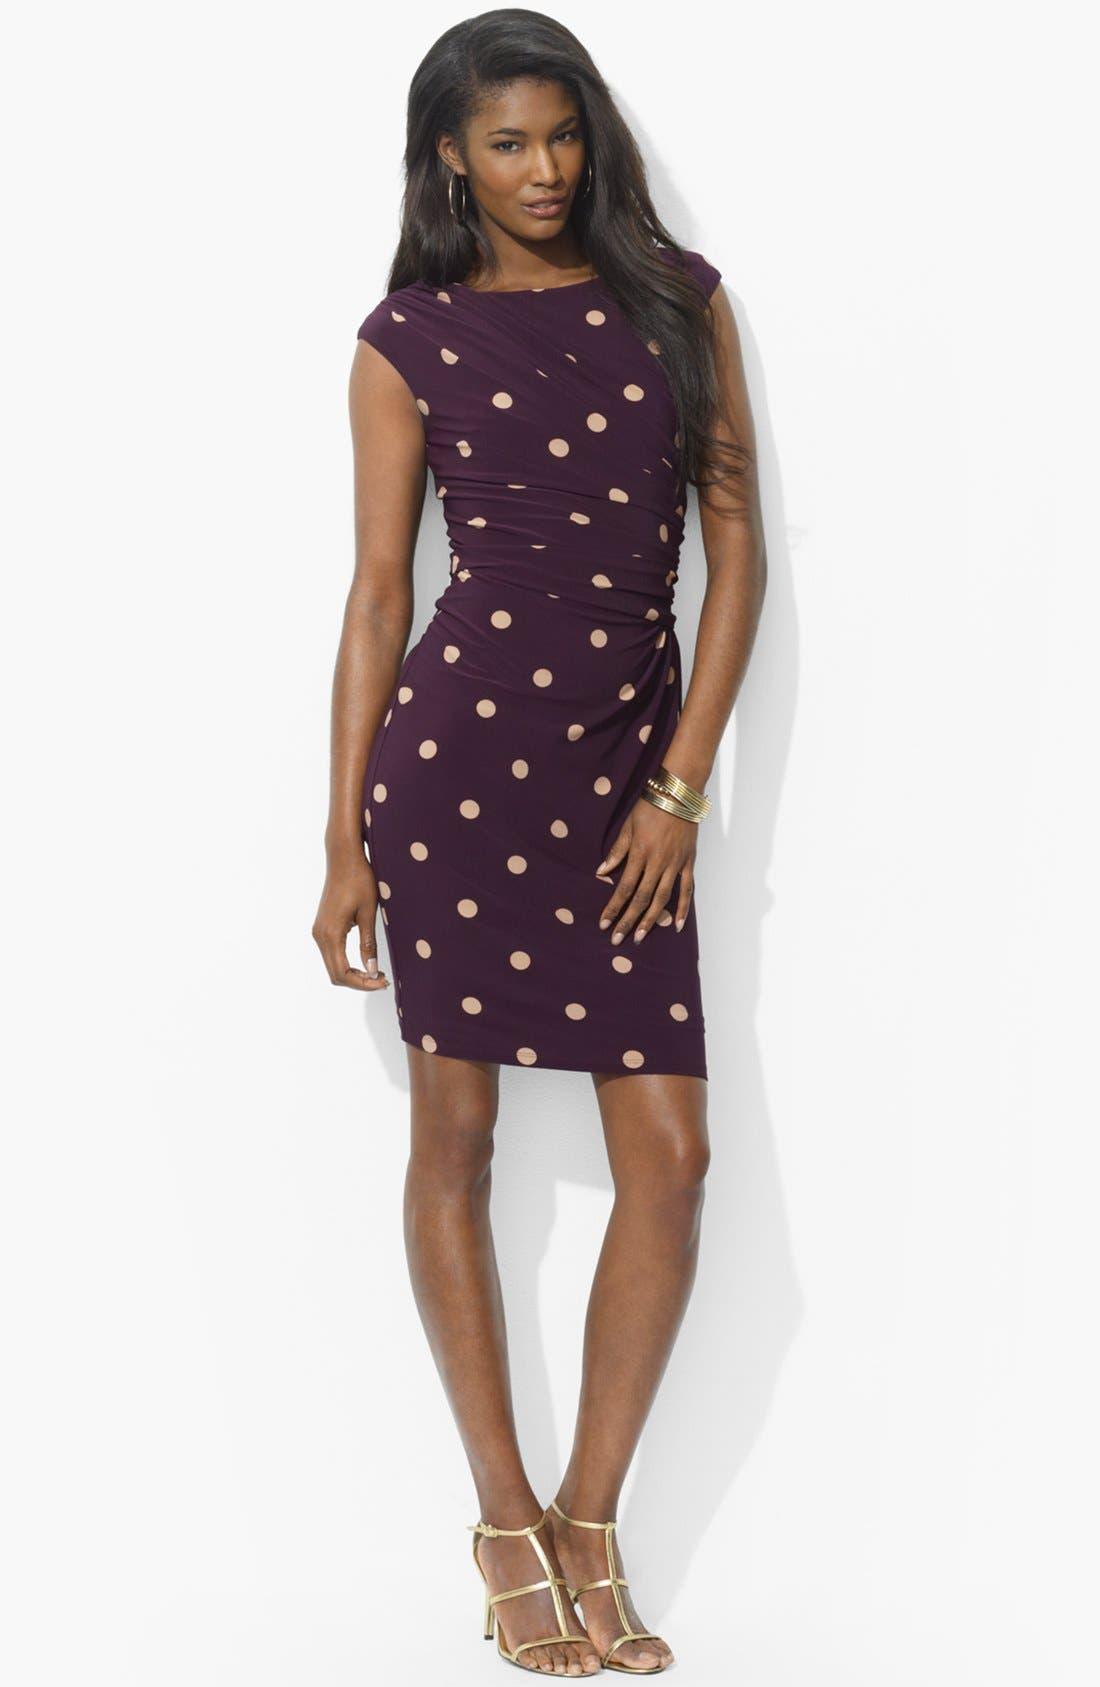 Alternate Image 1 Selected - Lauren Ralph Lauren Polka Dot Jersey Dress